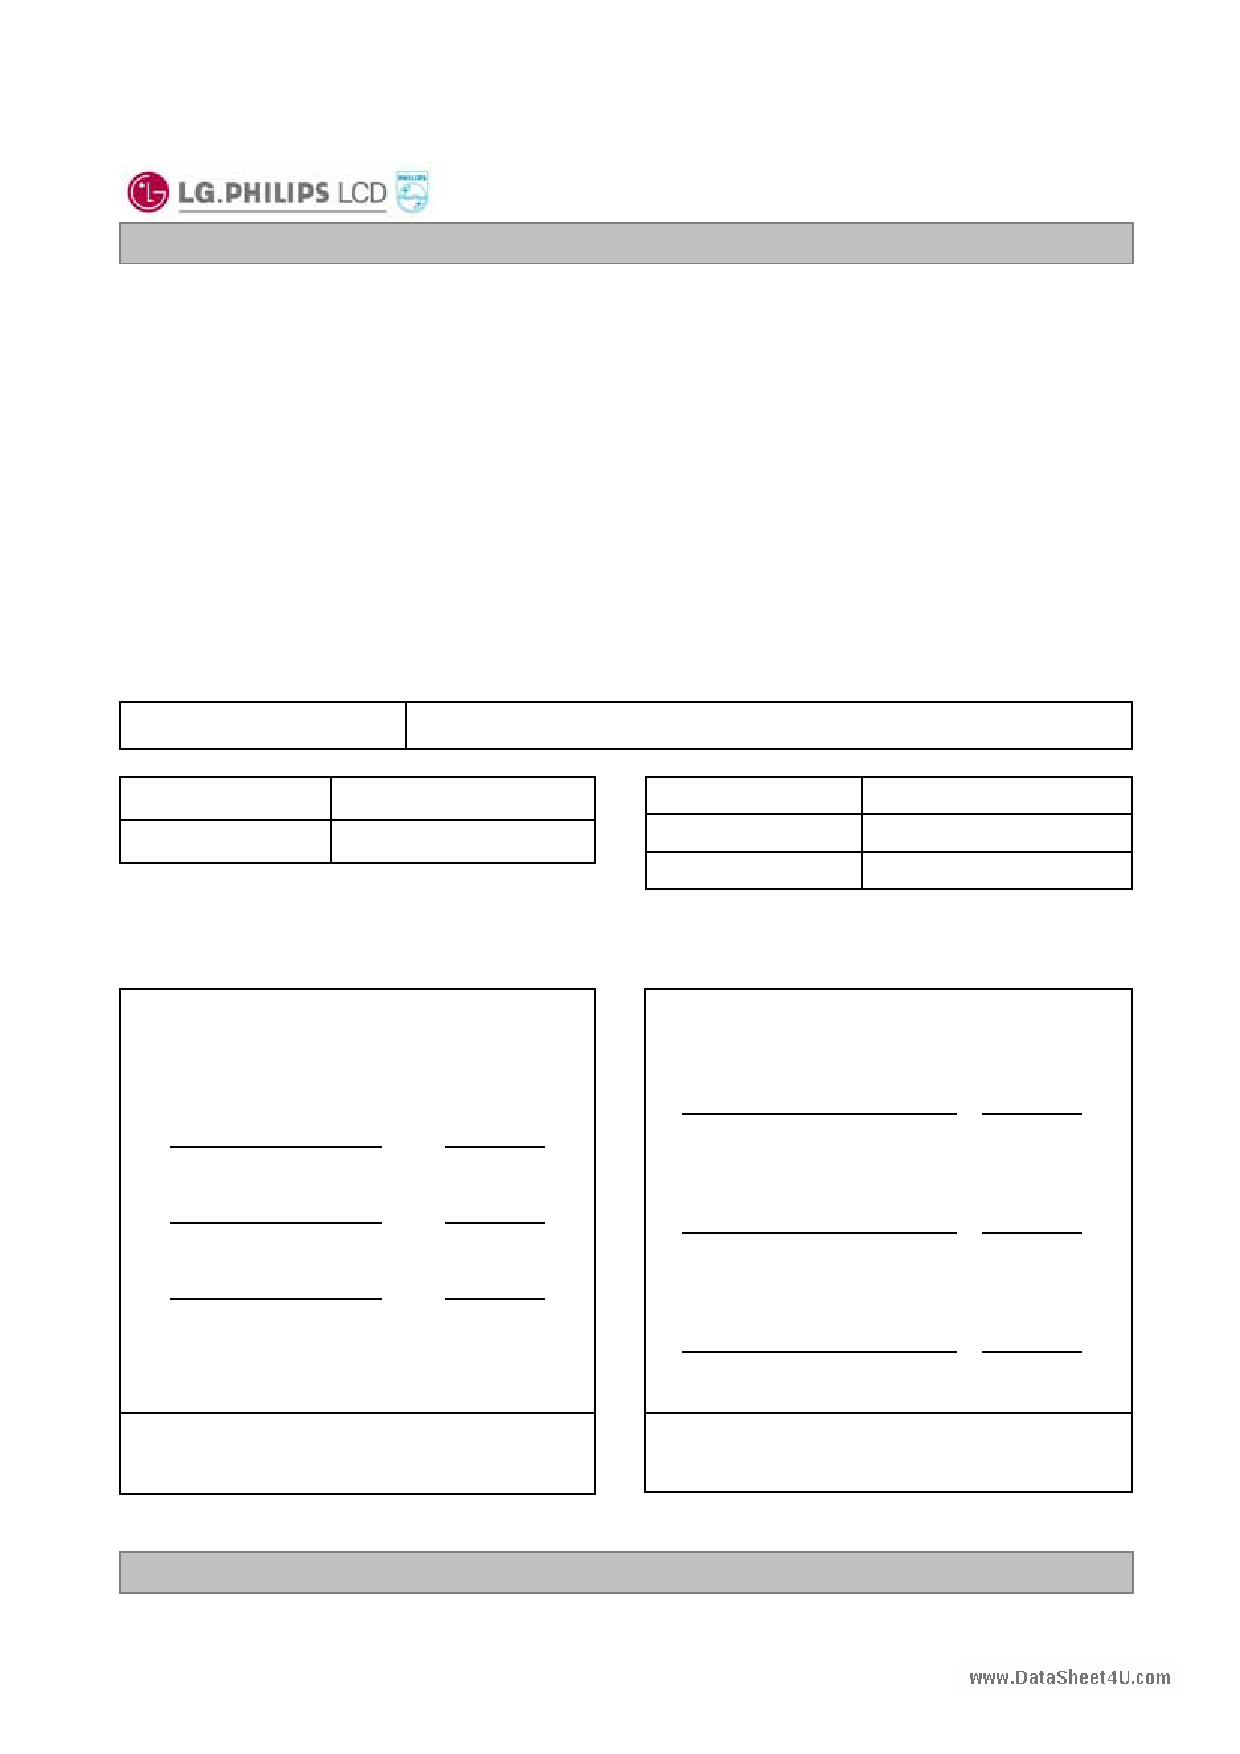 LB070WV4 دیتاشیت PDF